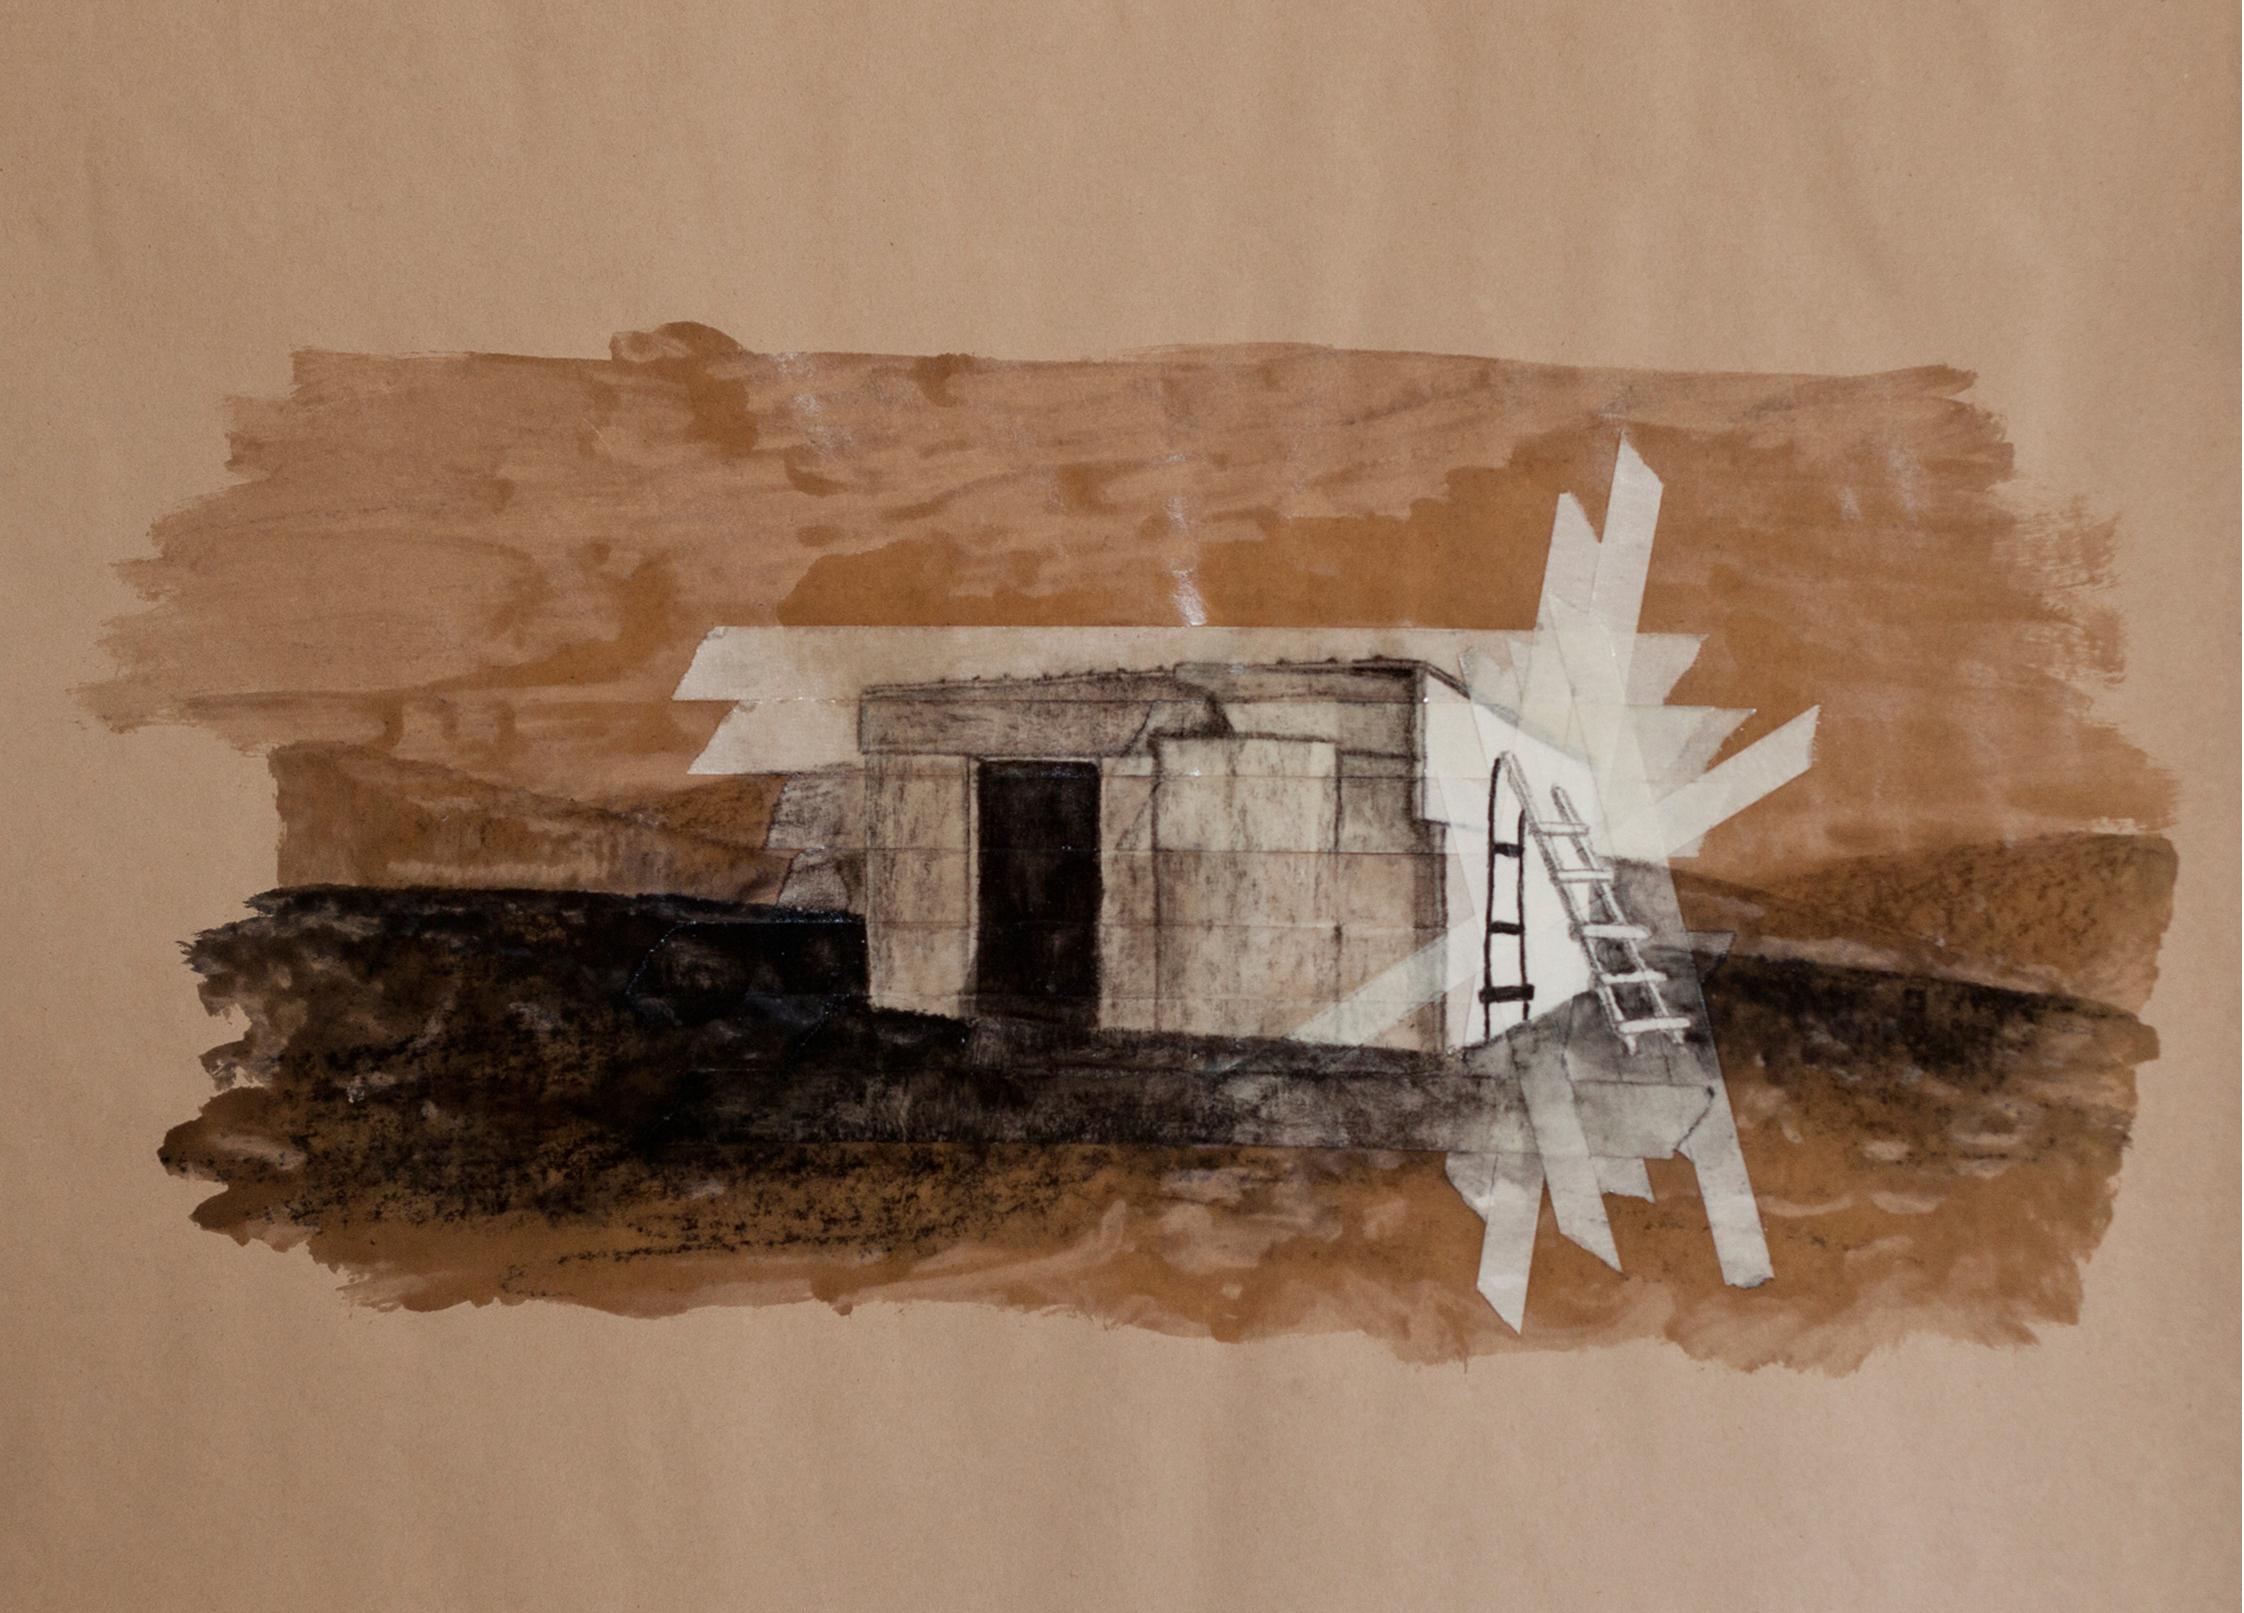 Megeron_Charcoal, Lacquer, Acrylic & Maskingtape on Brown Paper_30X40cm_2011.jpg